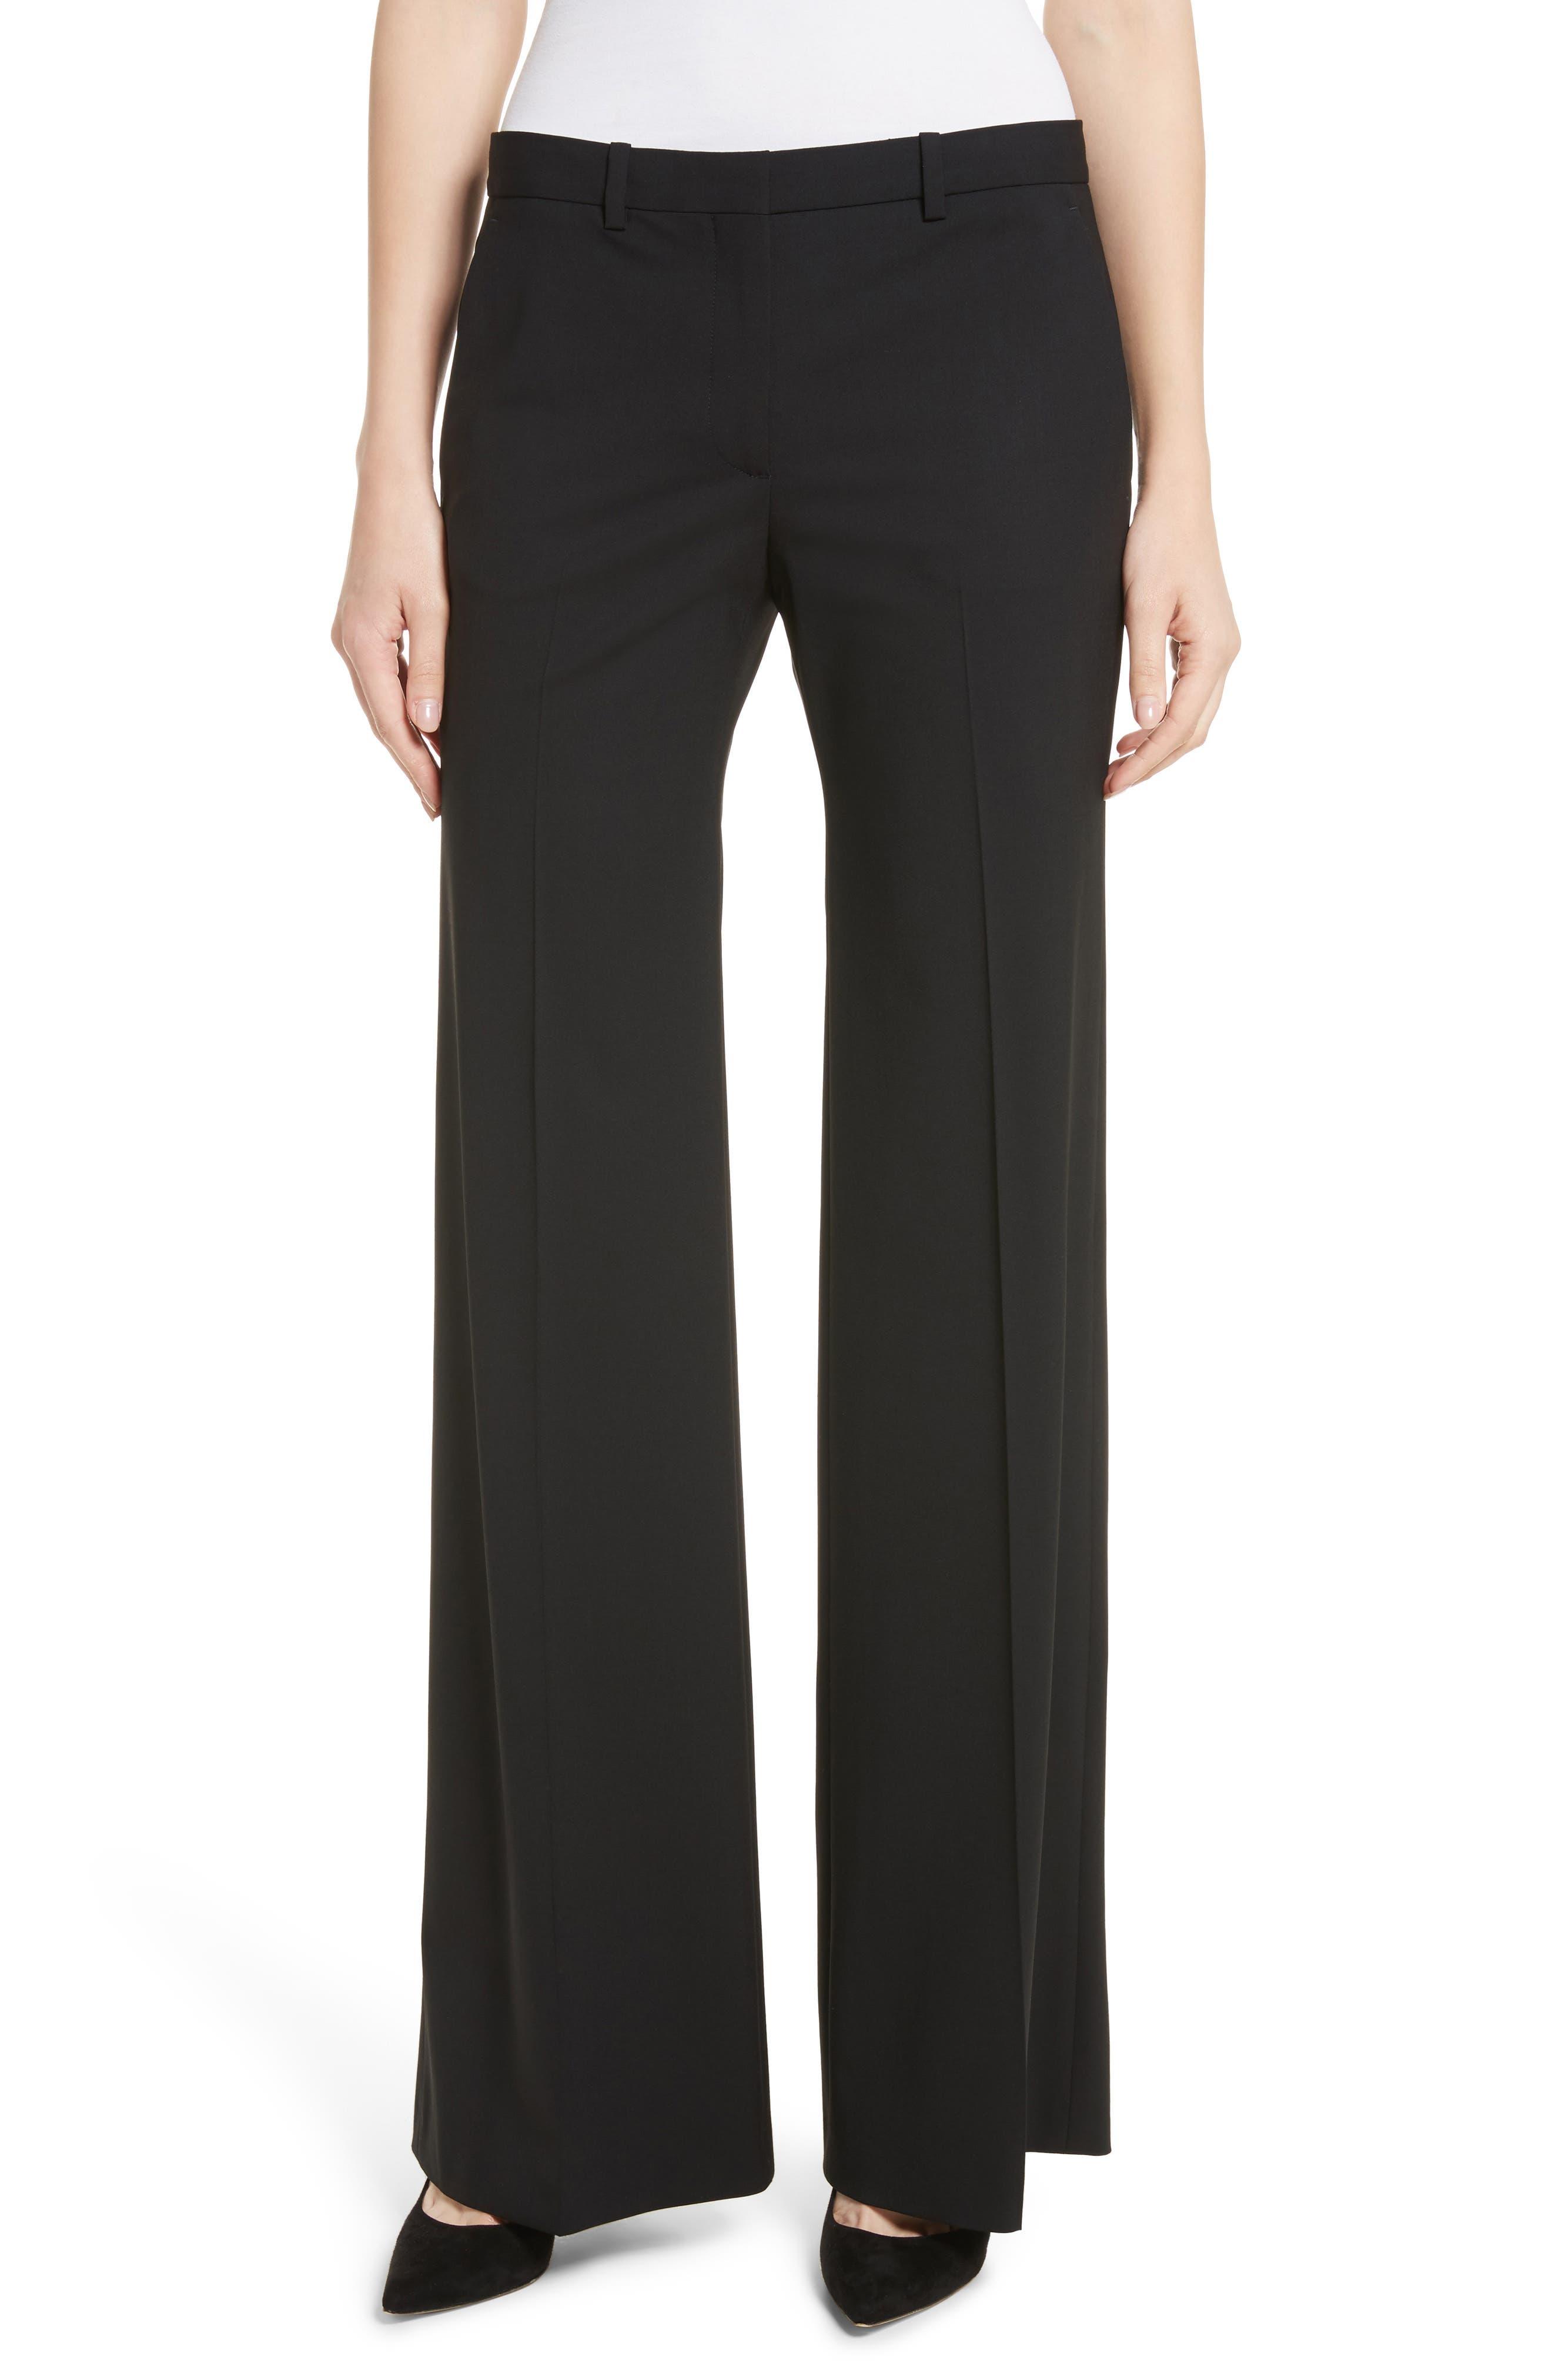 Demetria 2 Flare Leg Good Wool Suit Pants,                         Main,                         color, BLACK